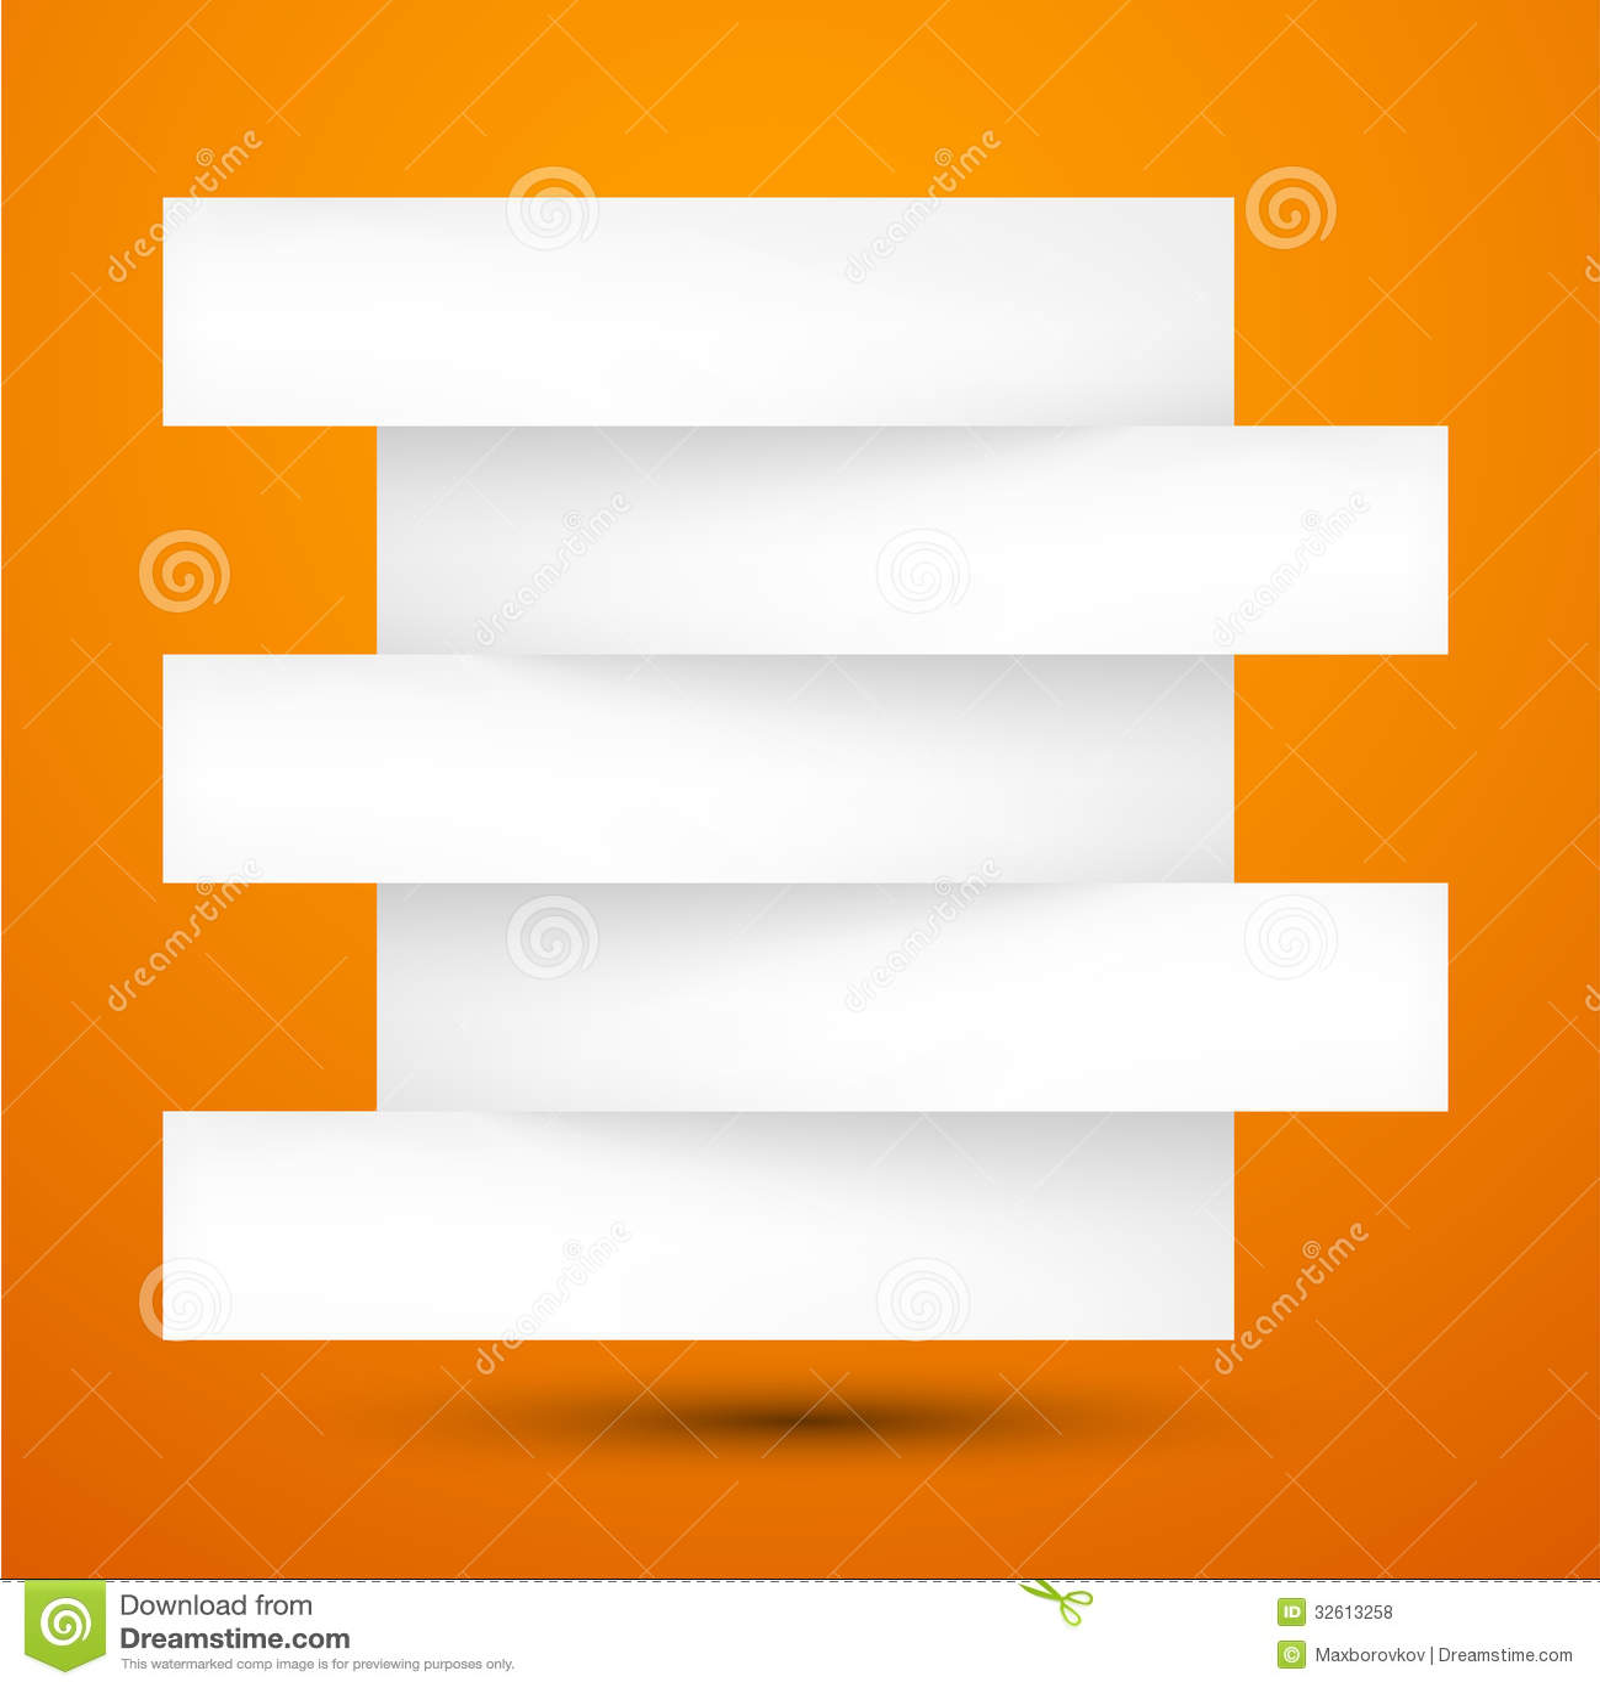 Microsoft White Paper Template Vosvetenet – Microsoft White Paper Template